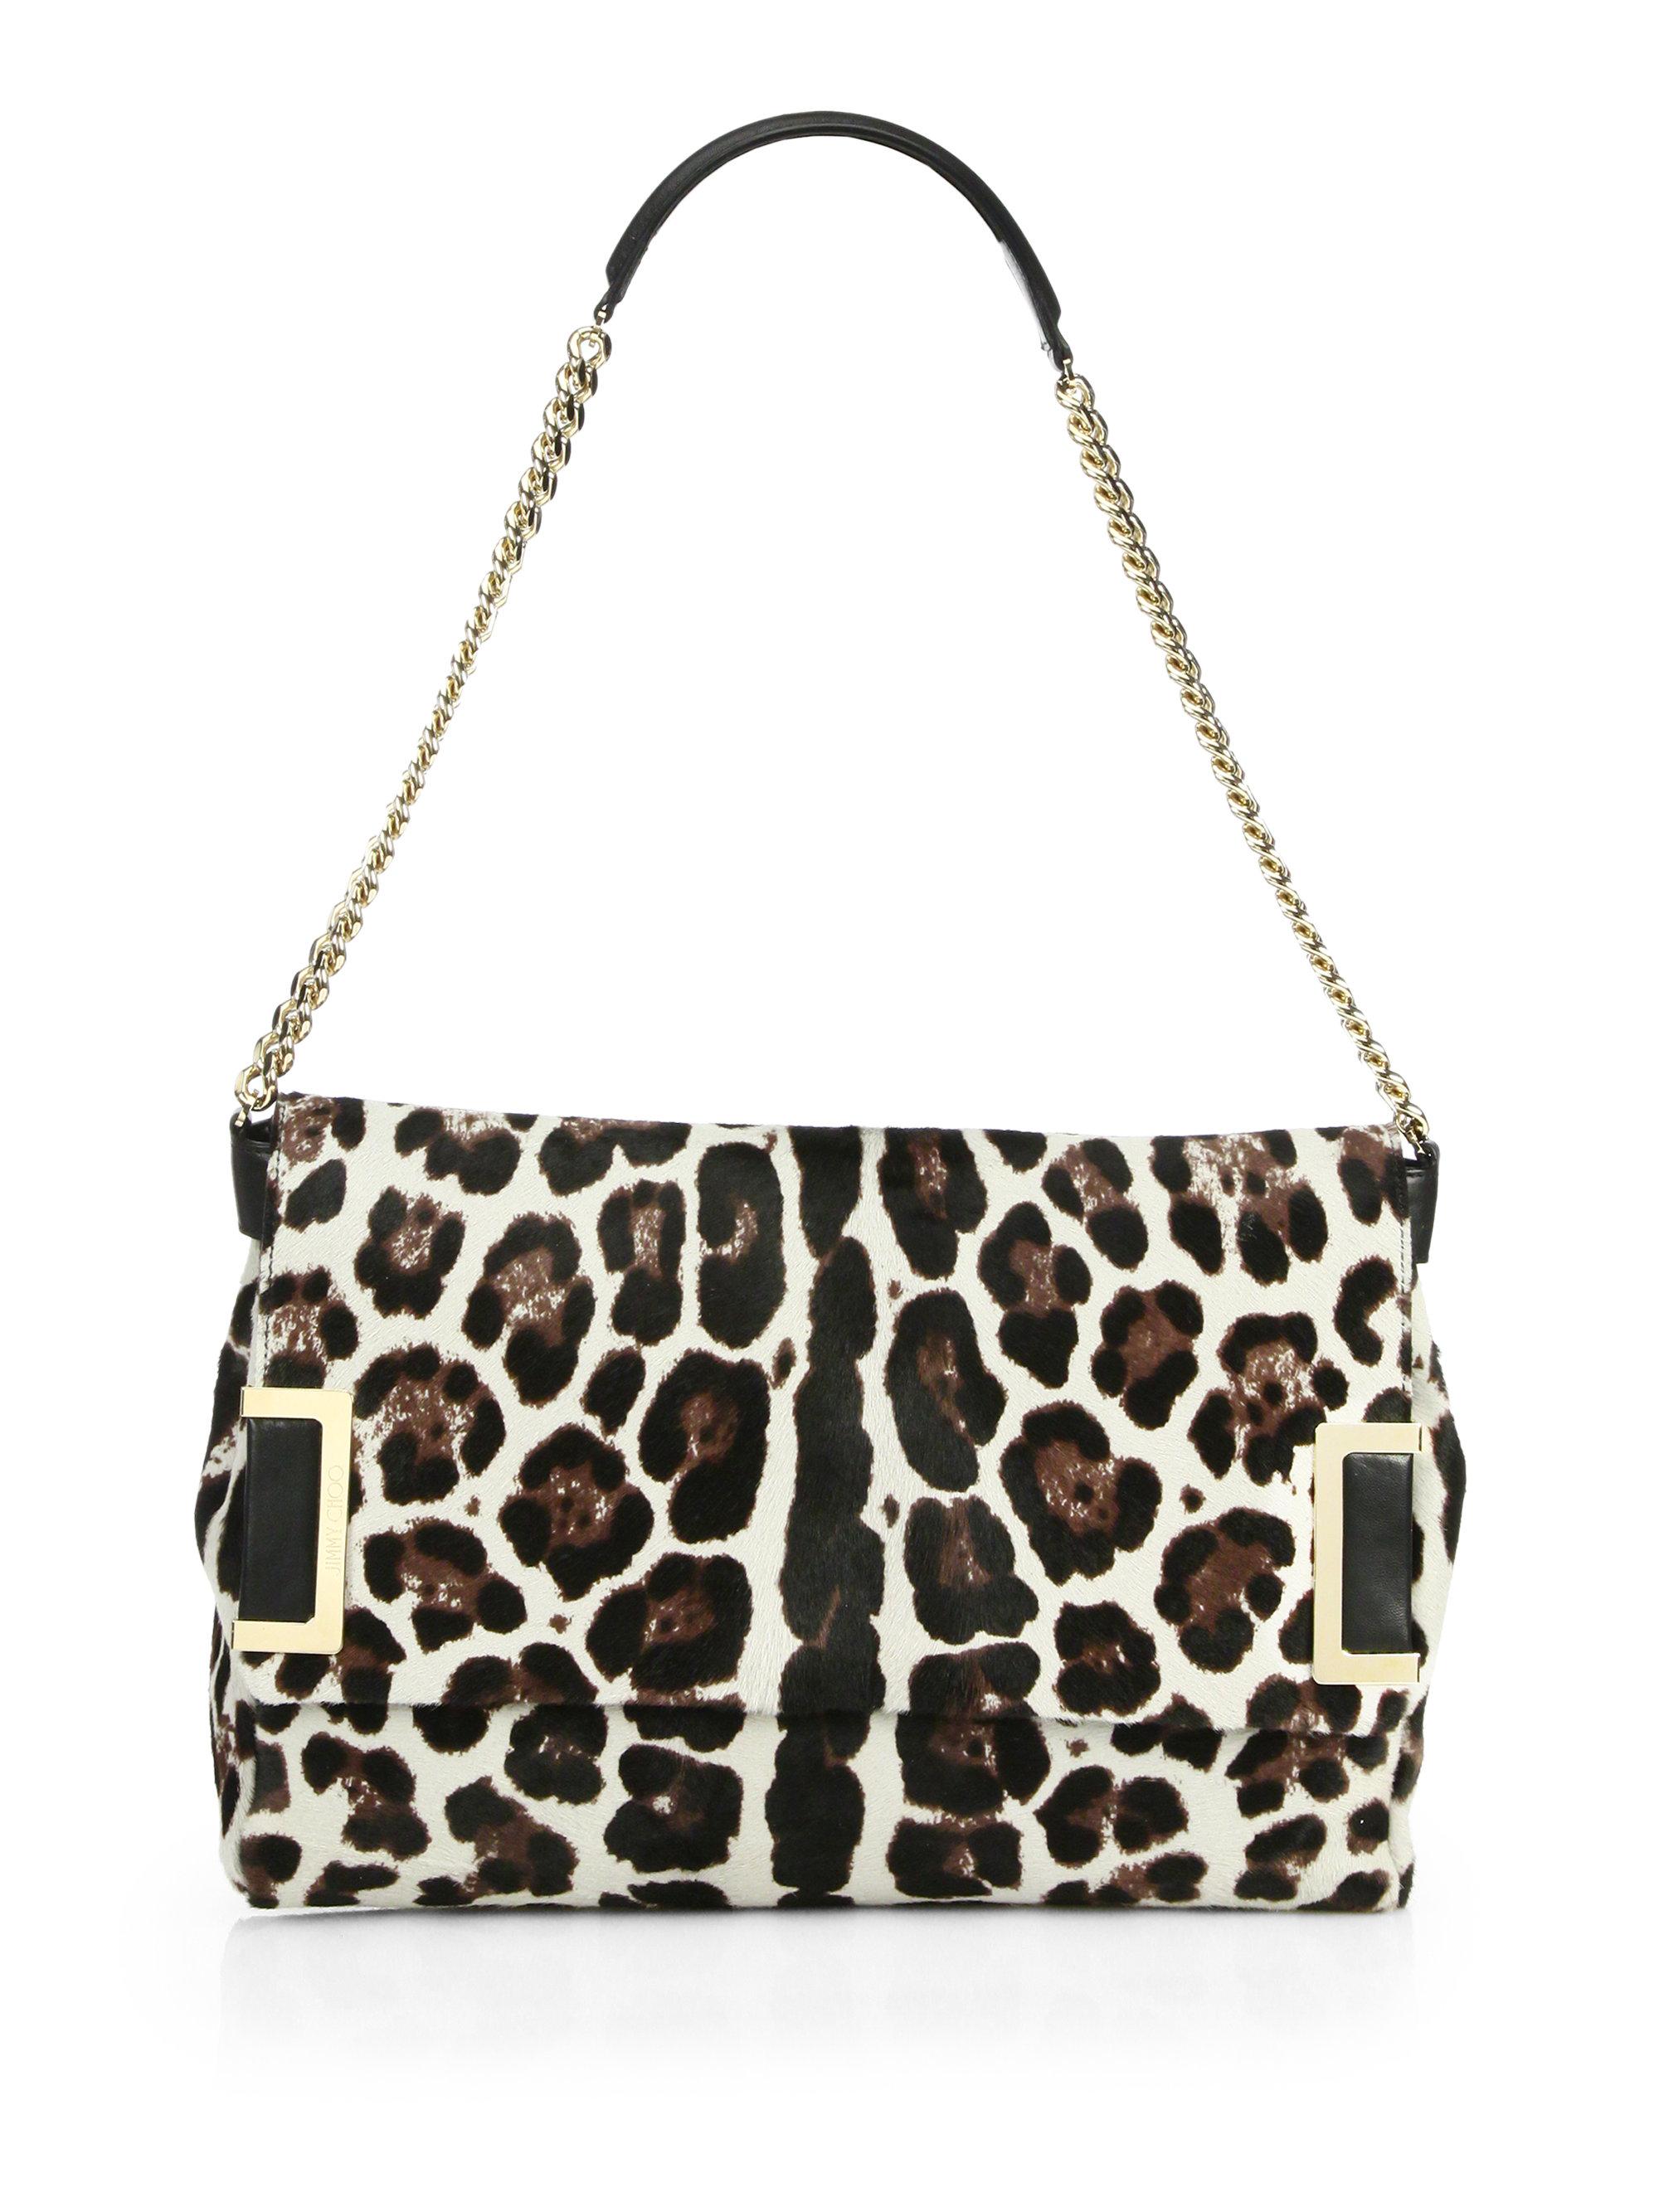 13bfe4ff7755 Jimmy Choo Ally Leopardprint Calf Hair Shoulder Bag - Lyst